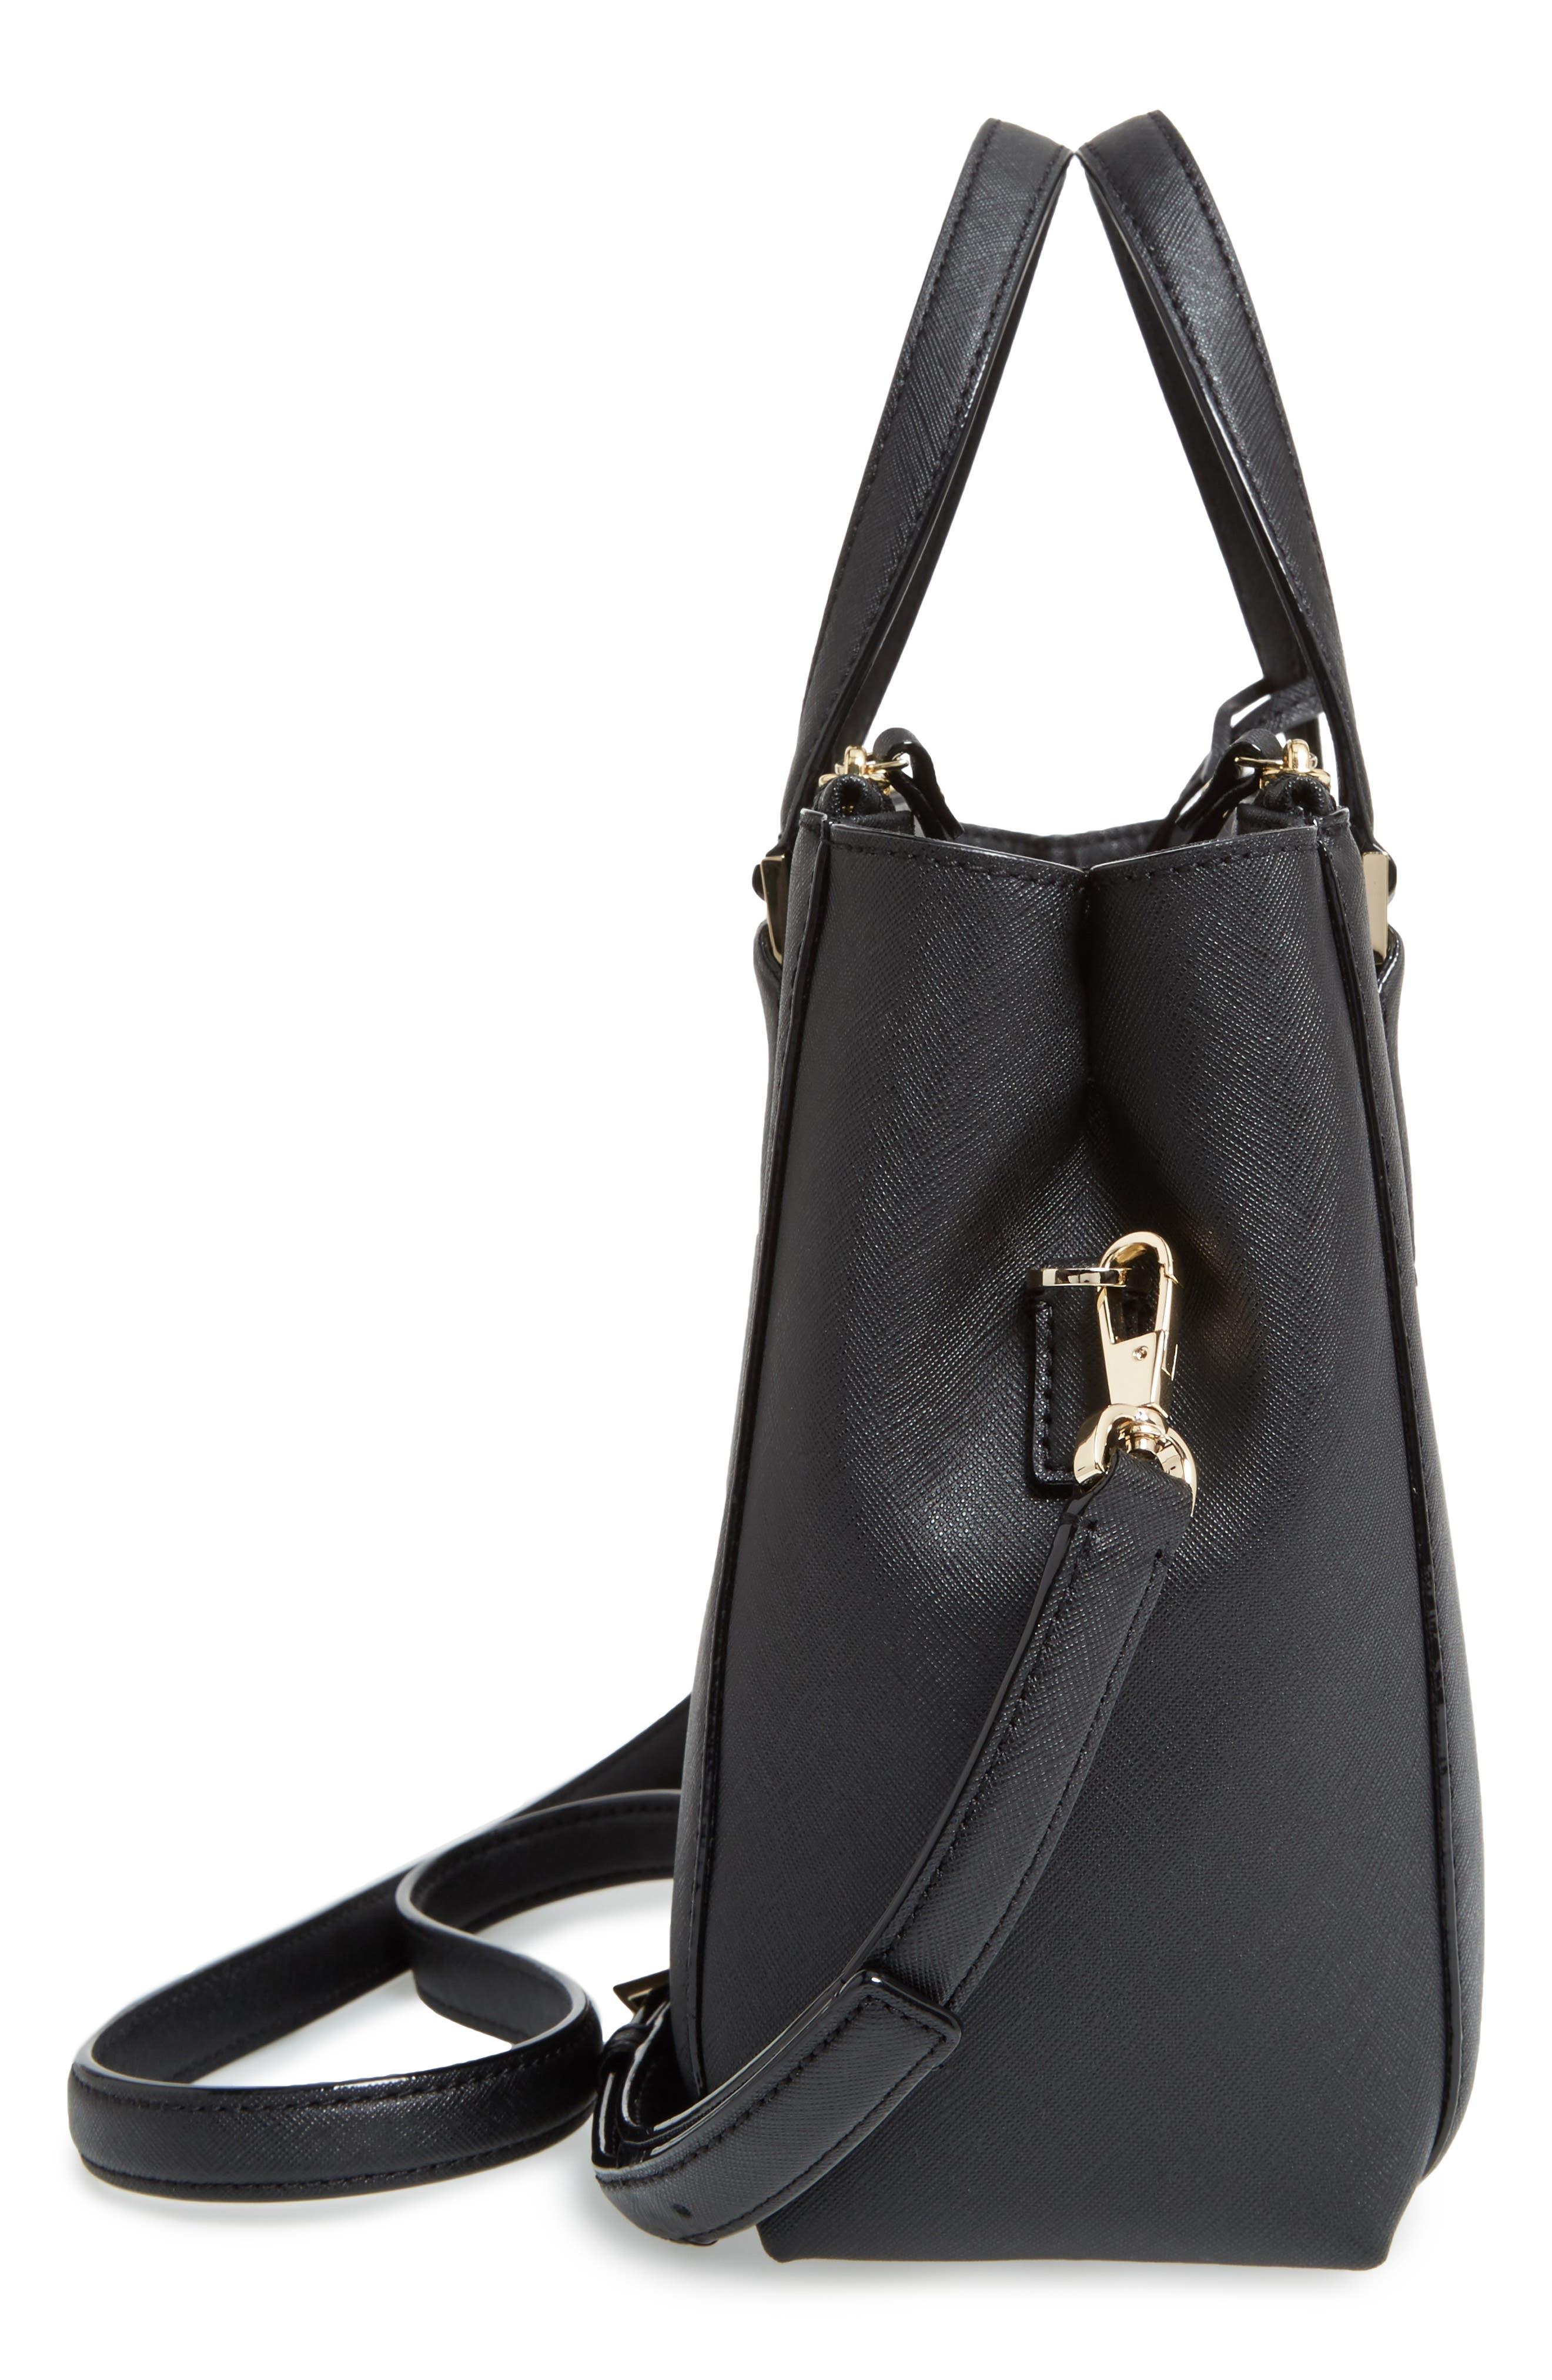 cameron street - teegan calfskin leather satchel,                             Alternate thumbnail 5, color,                             Black